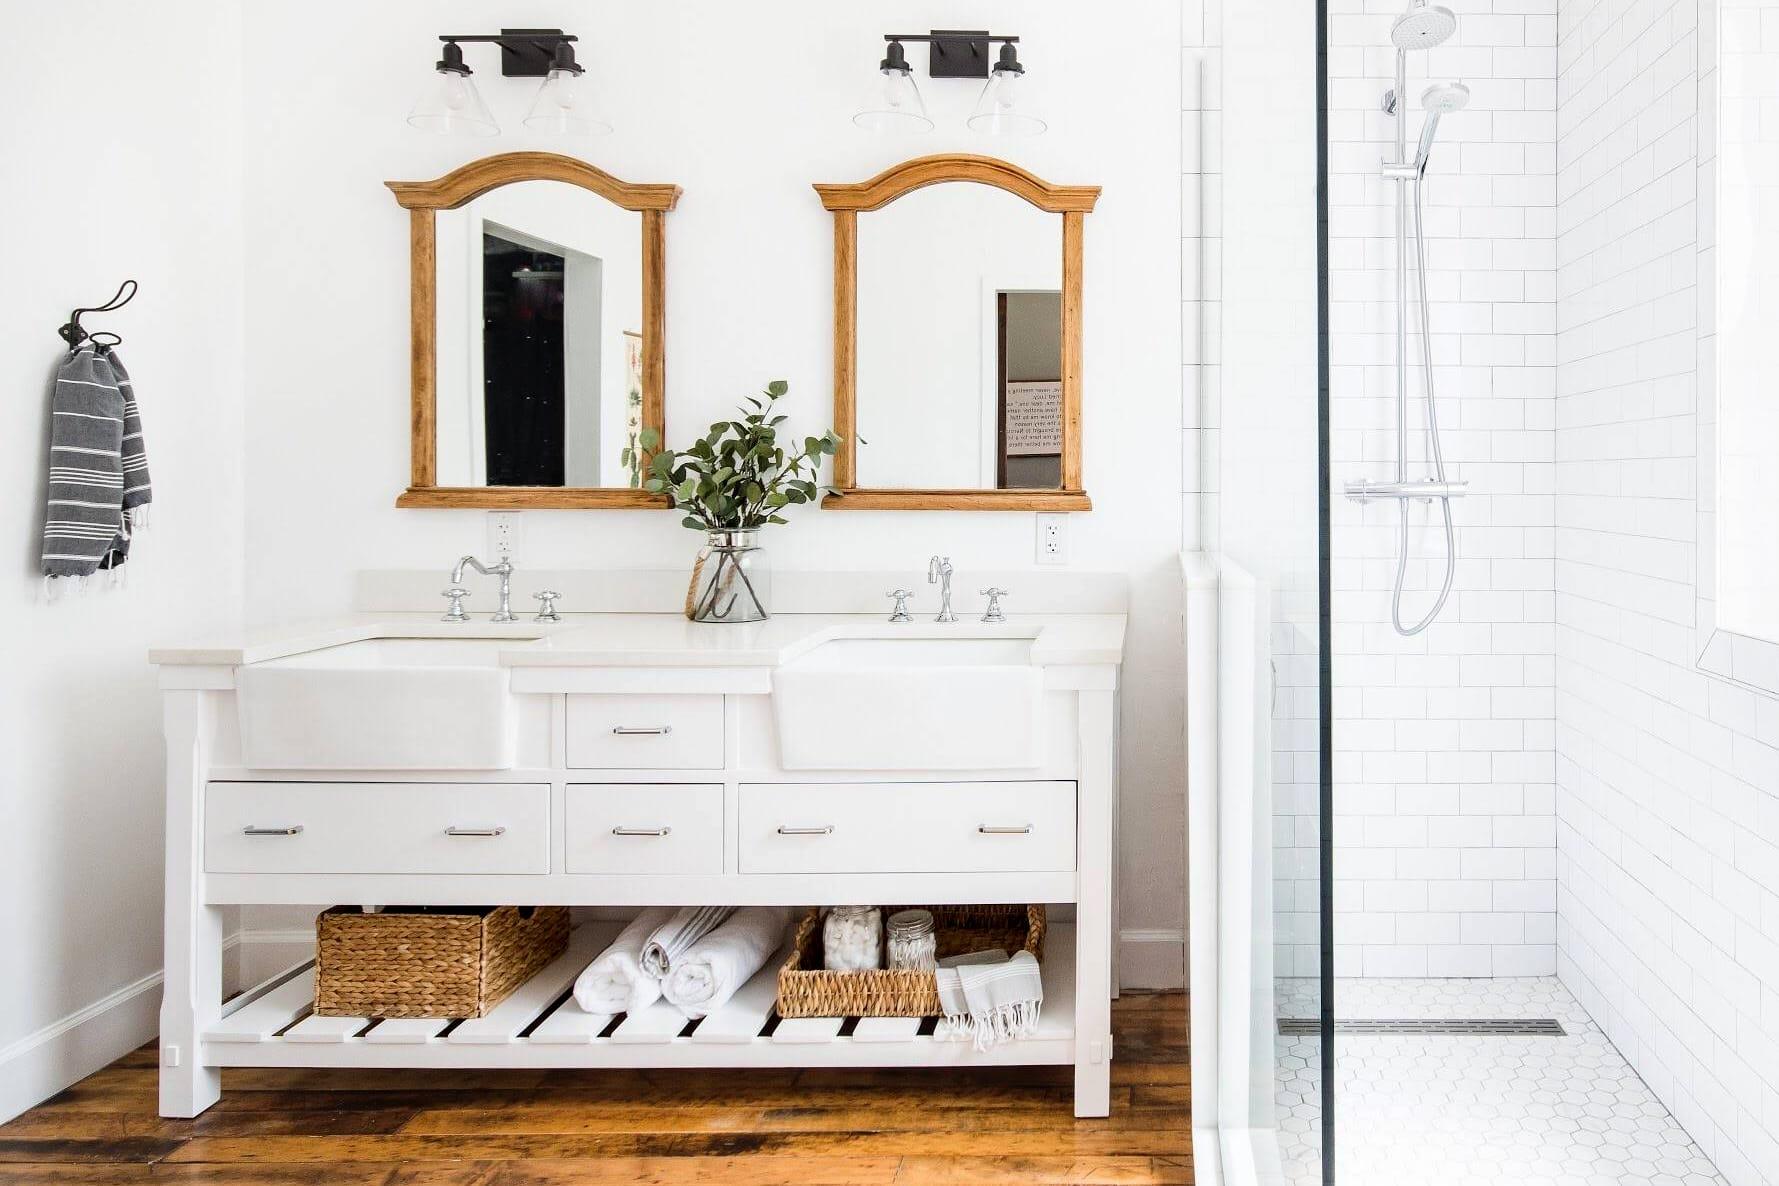 Farmhouse Sinks For The Bathroom Qualitybath Com Discover